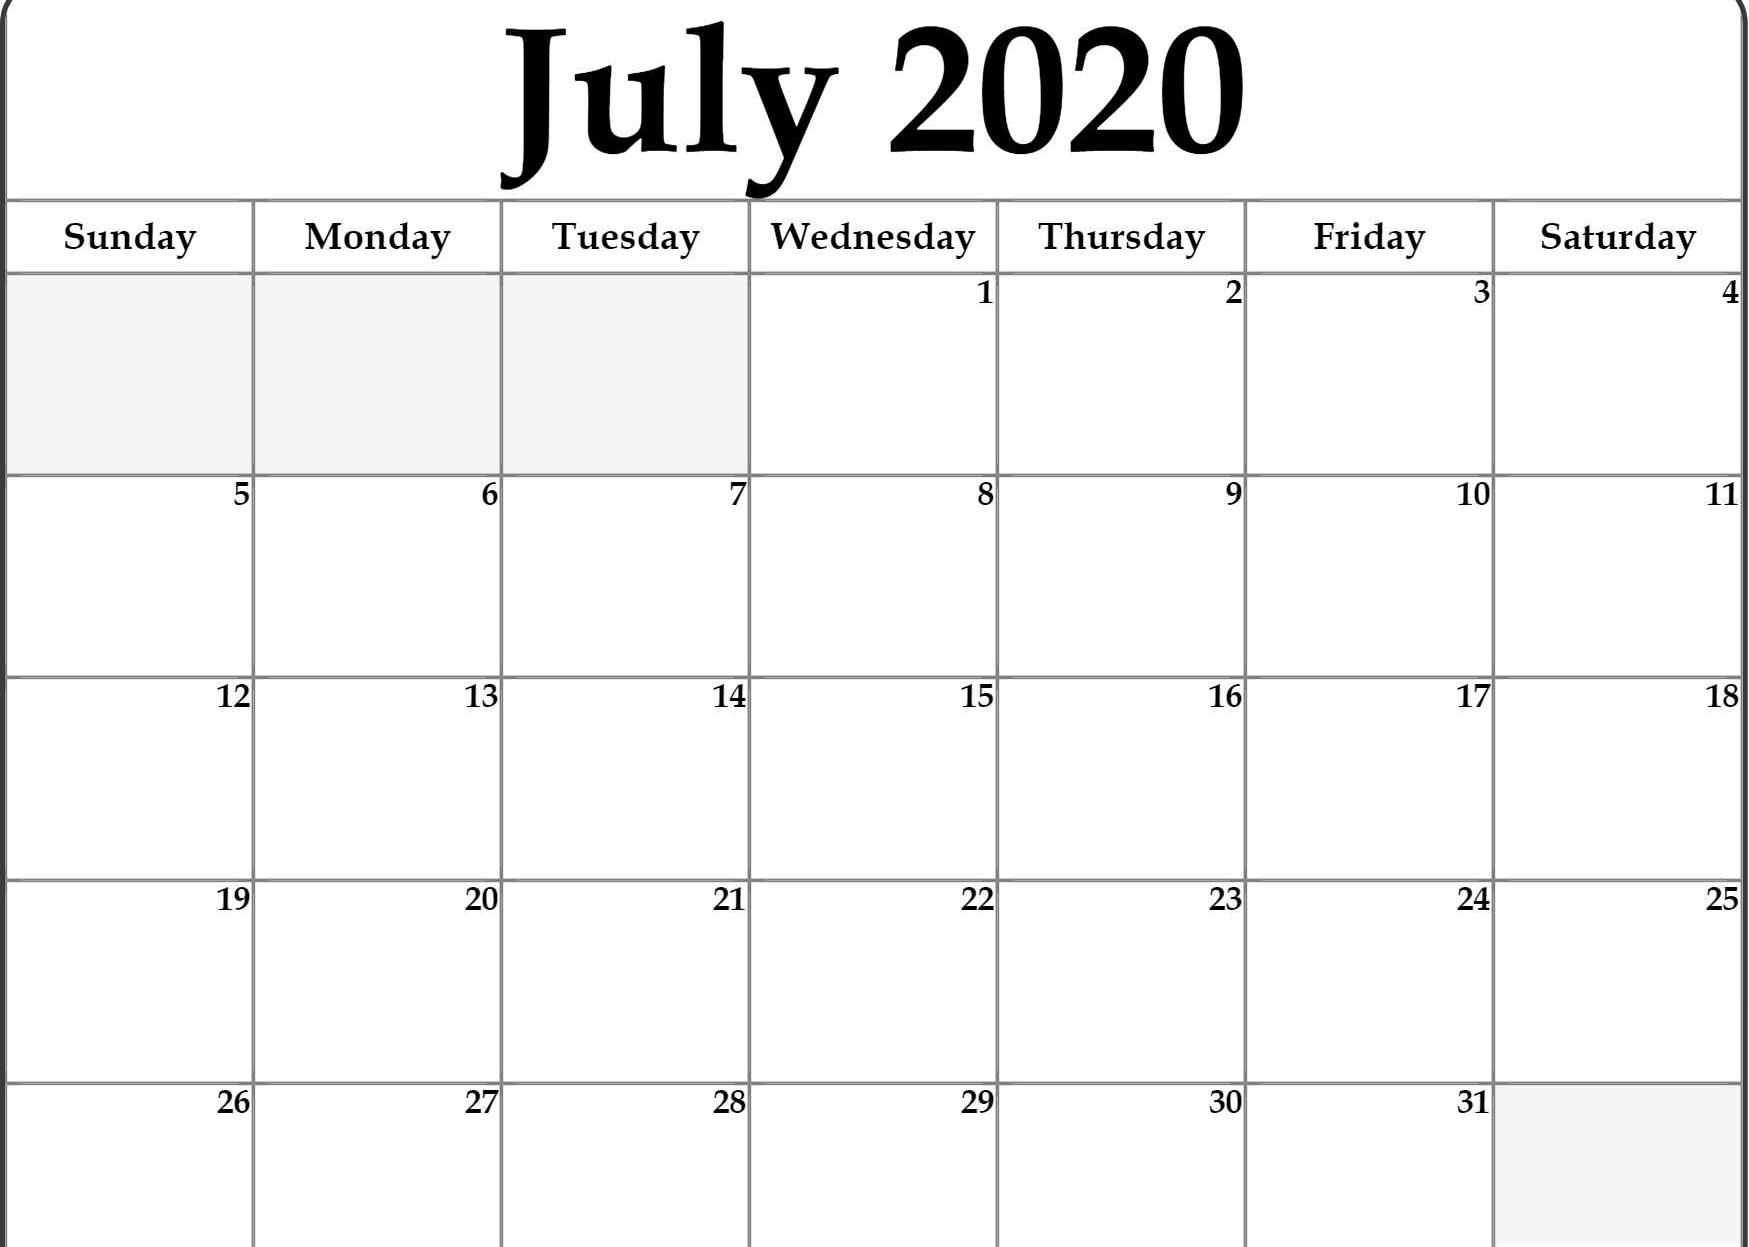 July 2020 Calendar Pdf, Word, Excel Printable Template